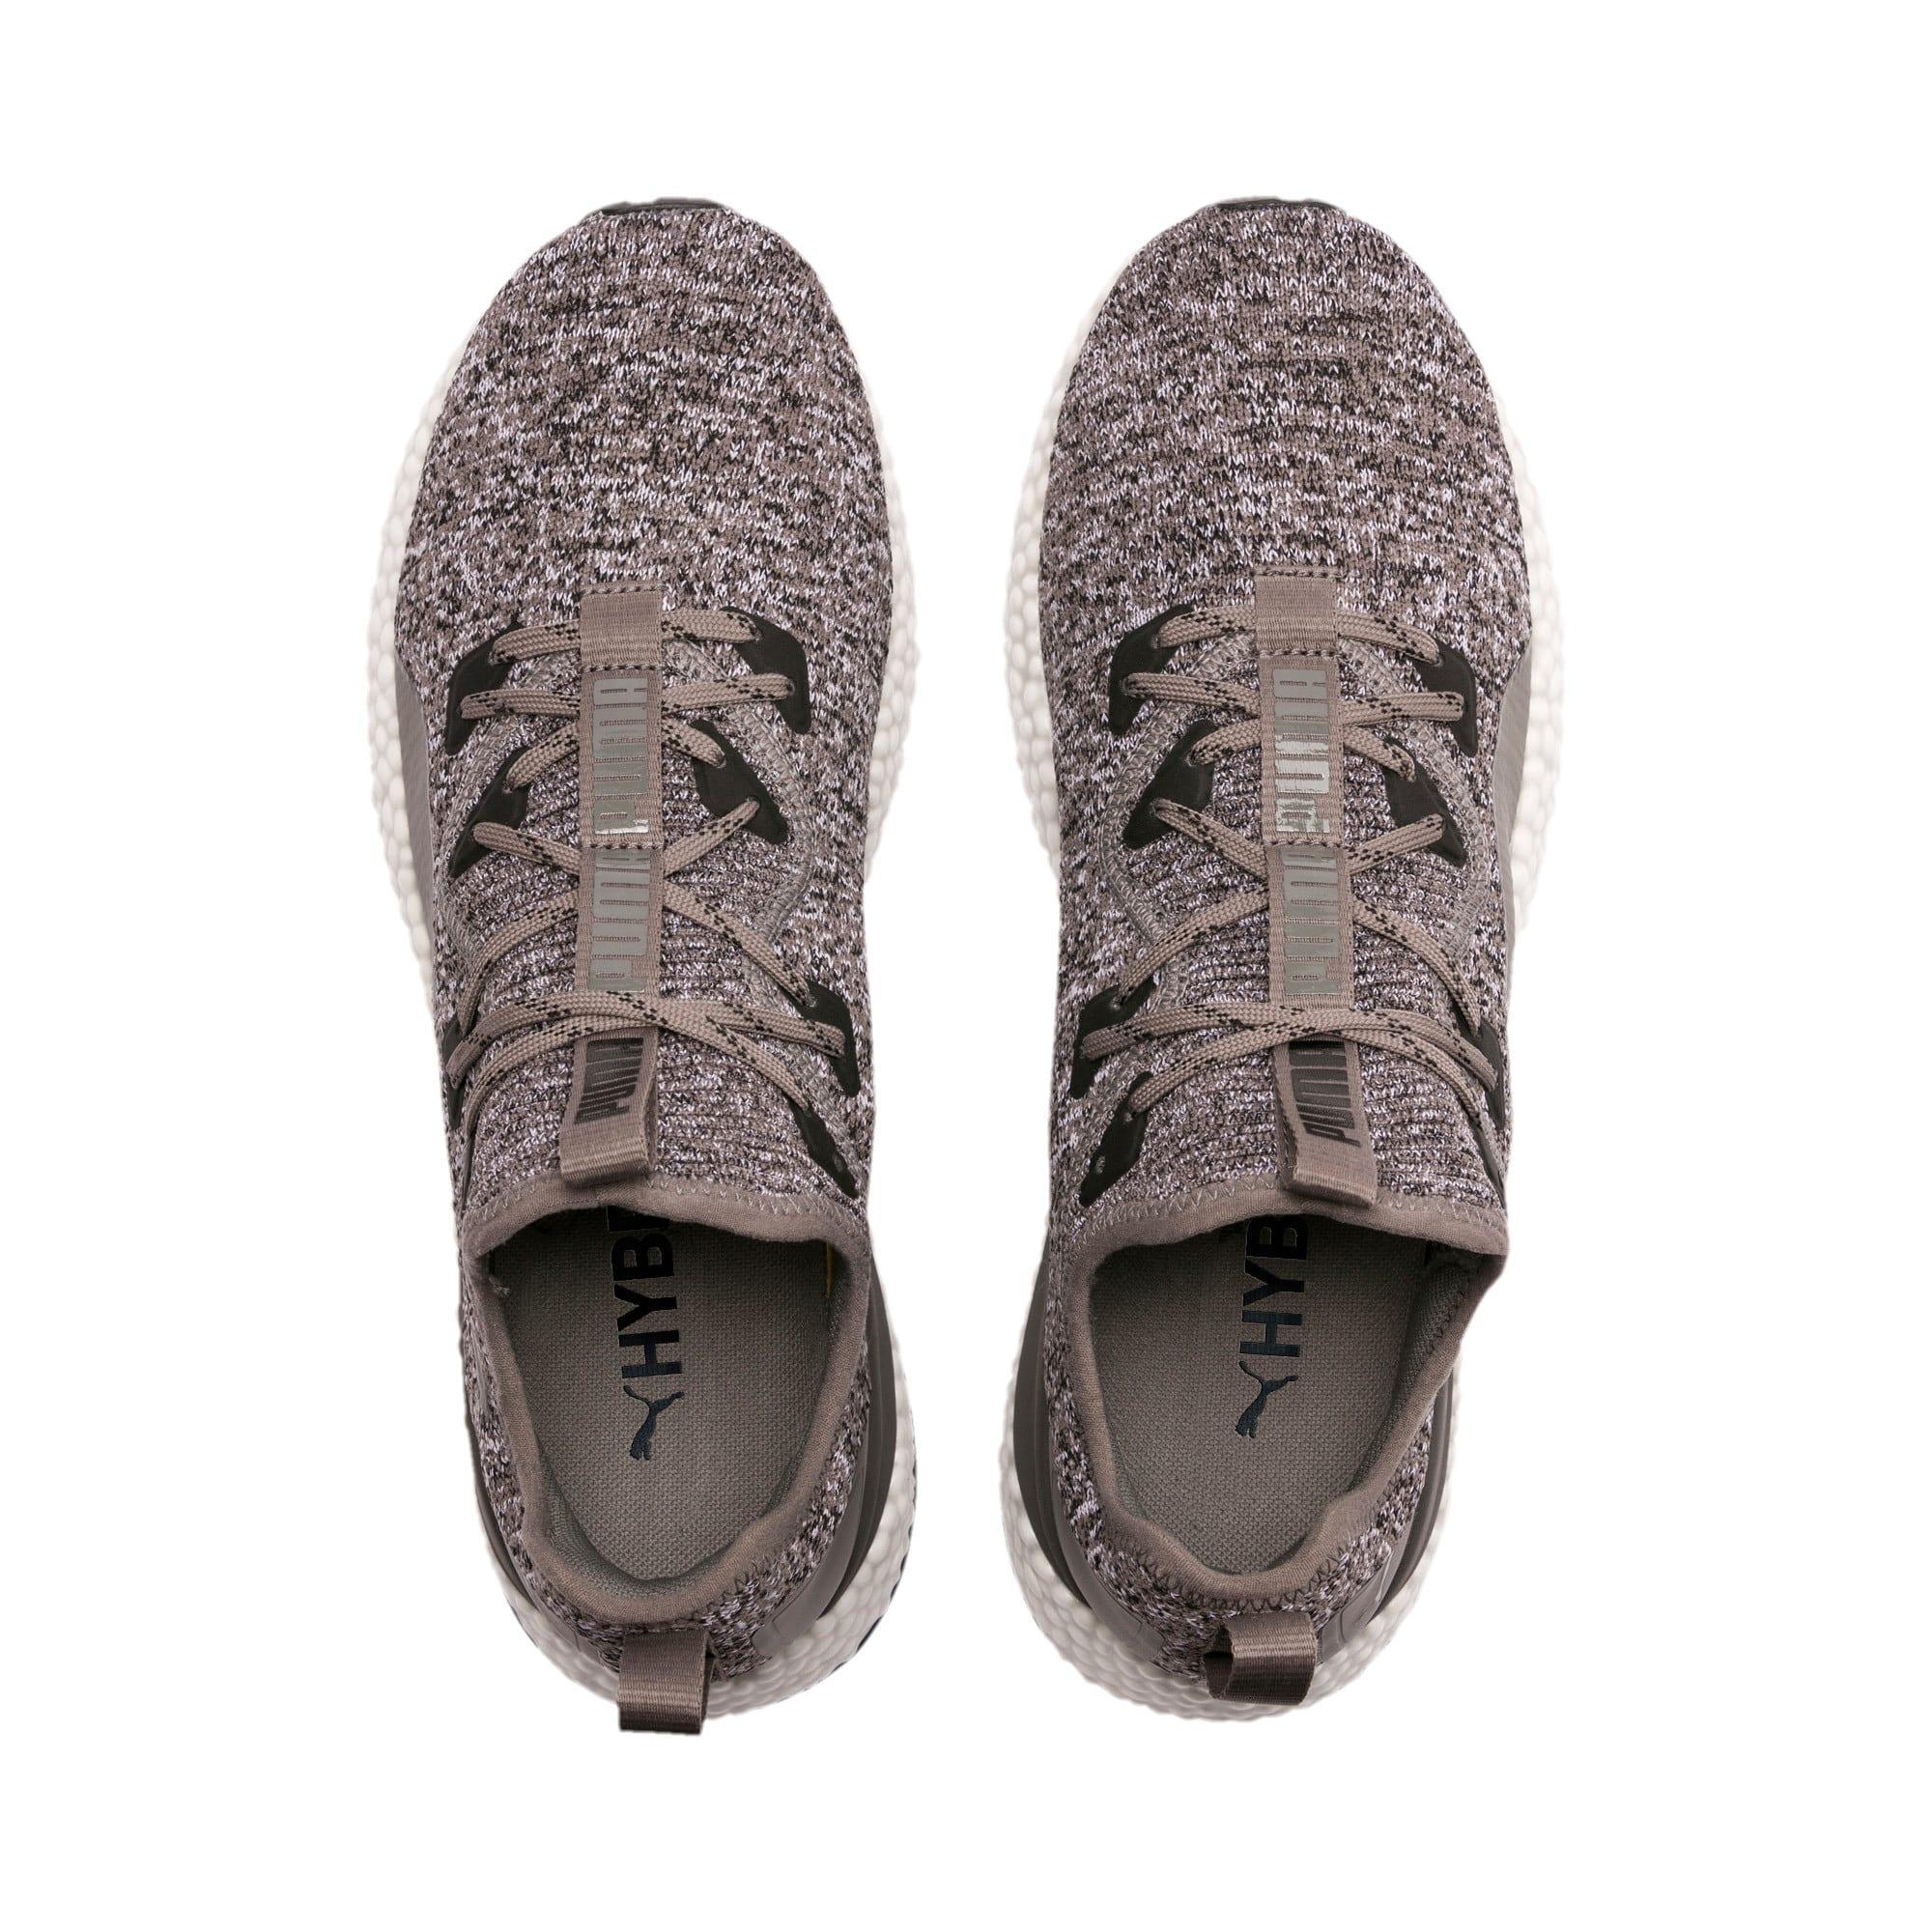 Thumbnail 7 of Hybrid Runner Men's Running Shoes, Charcoal Gray-Puma White, medium-IND